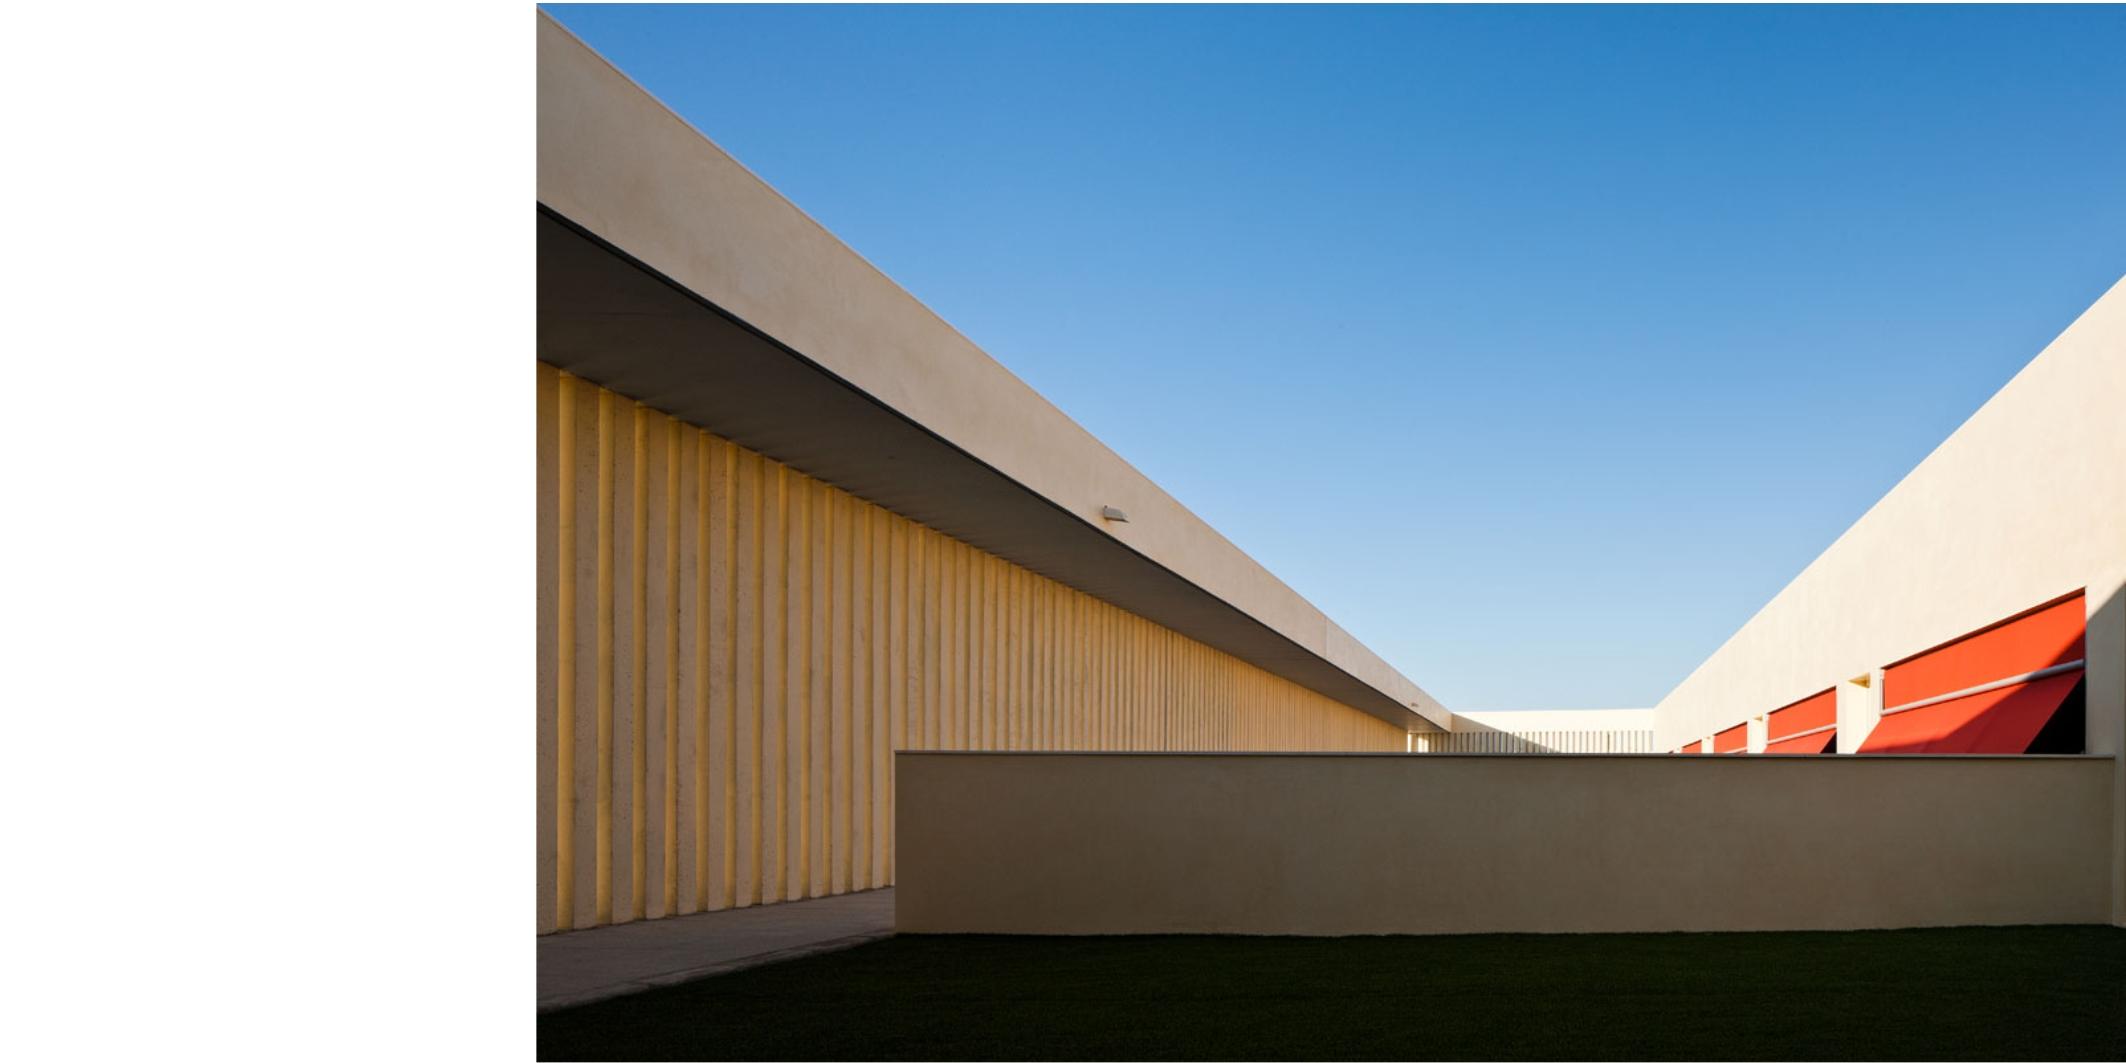 Estudio de arquitectura javier terrados sevilla espaa for Estudio de arquitectura